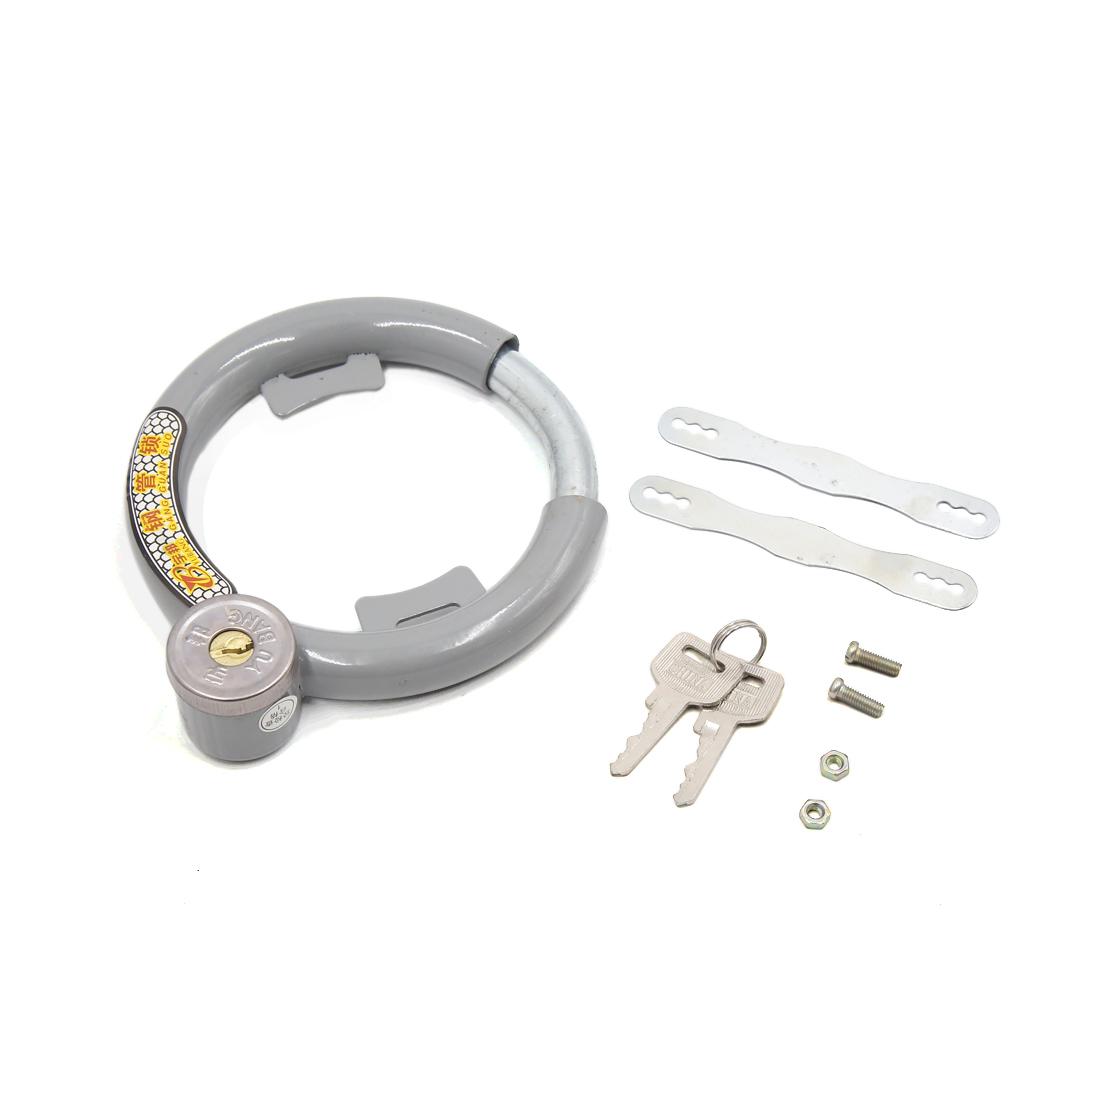 Universal Bike Silver Tone Stainless Stell Circle Type Anti Thief Lock w 2 Keys